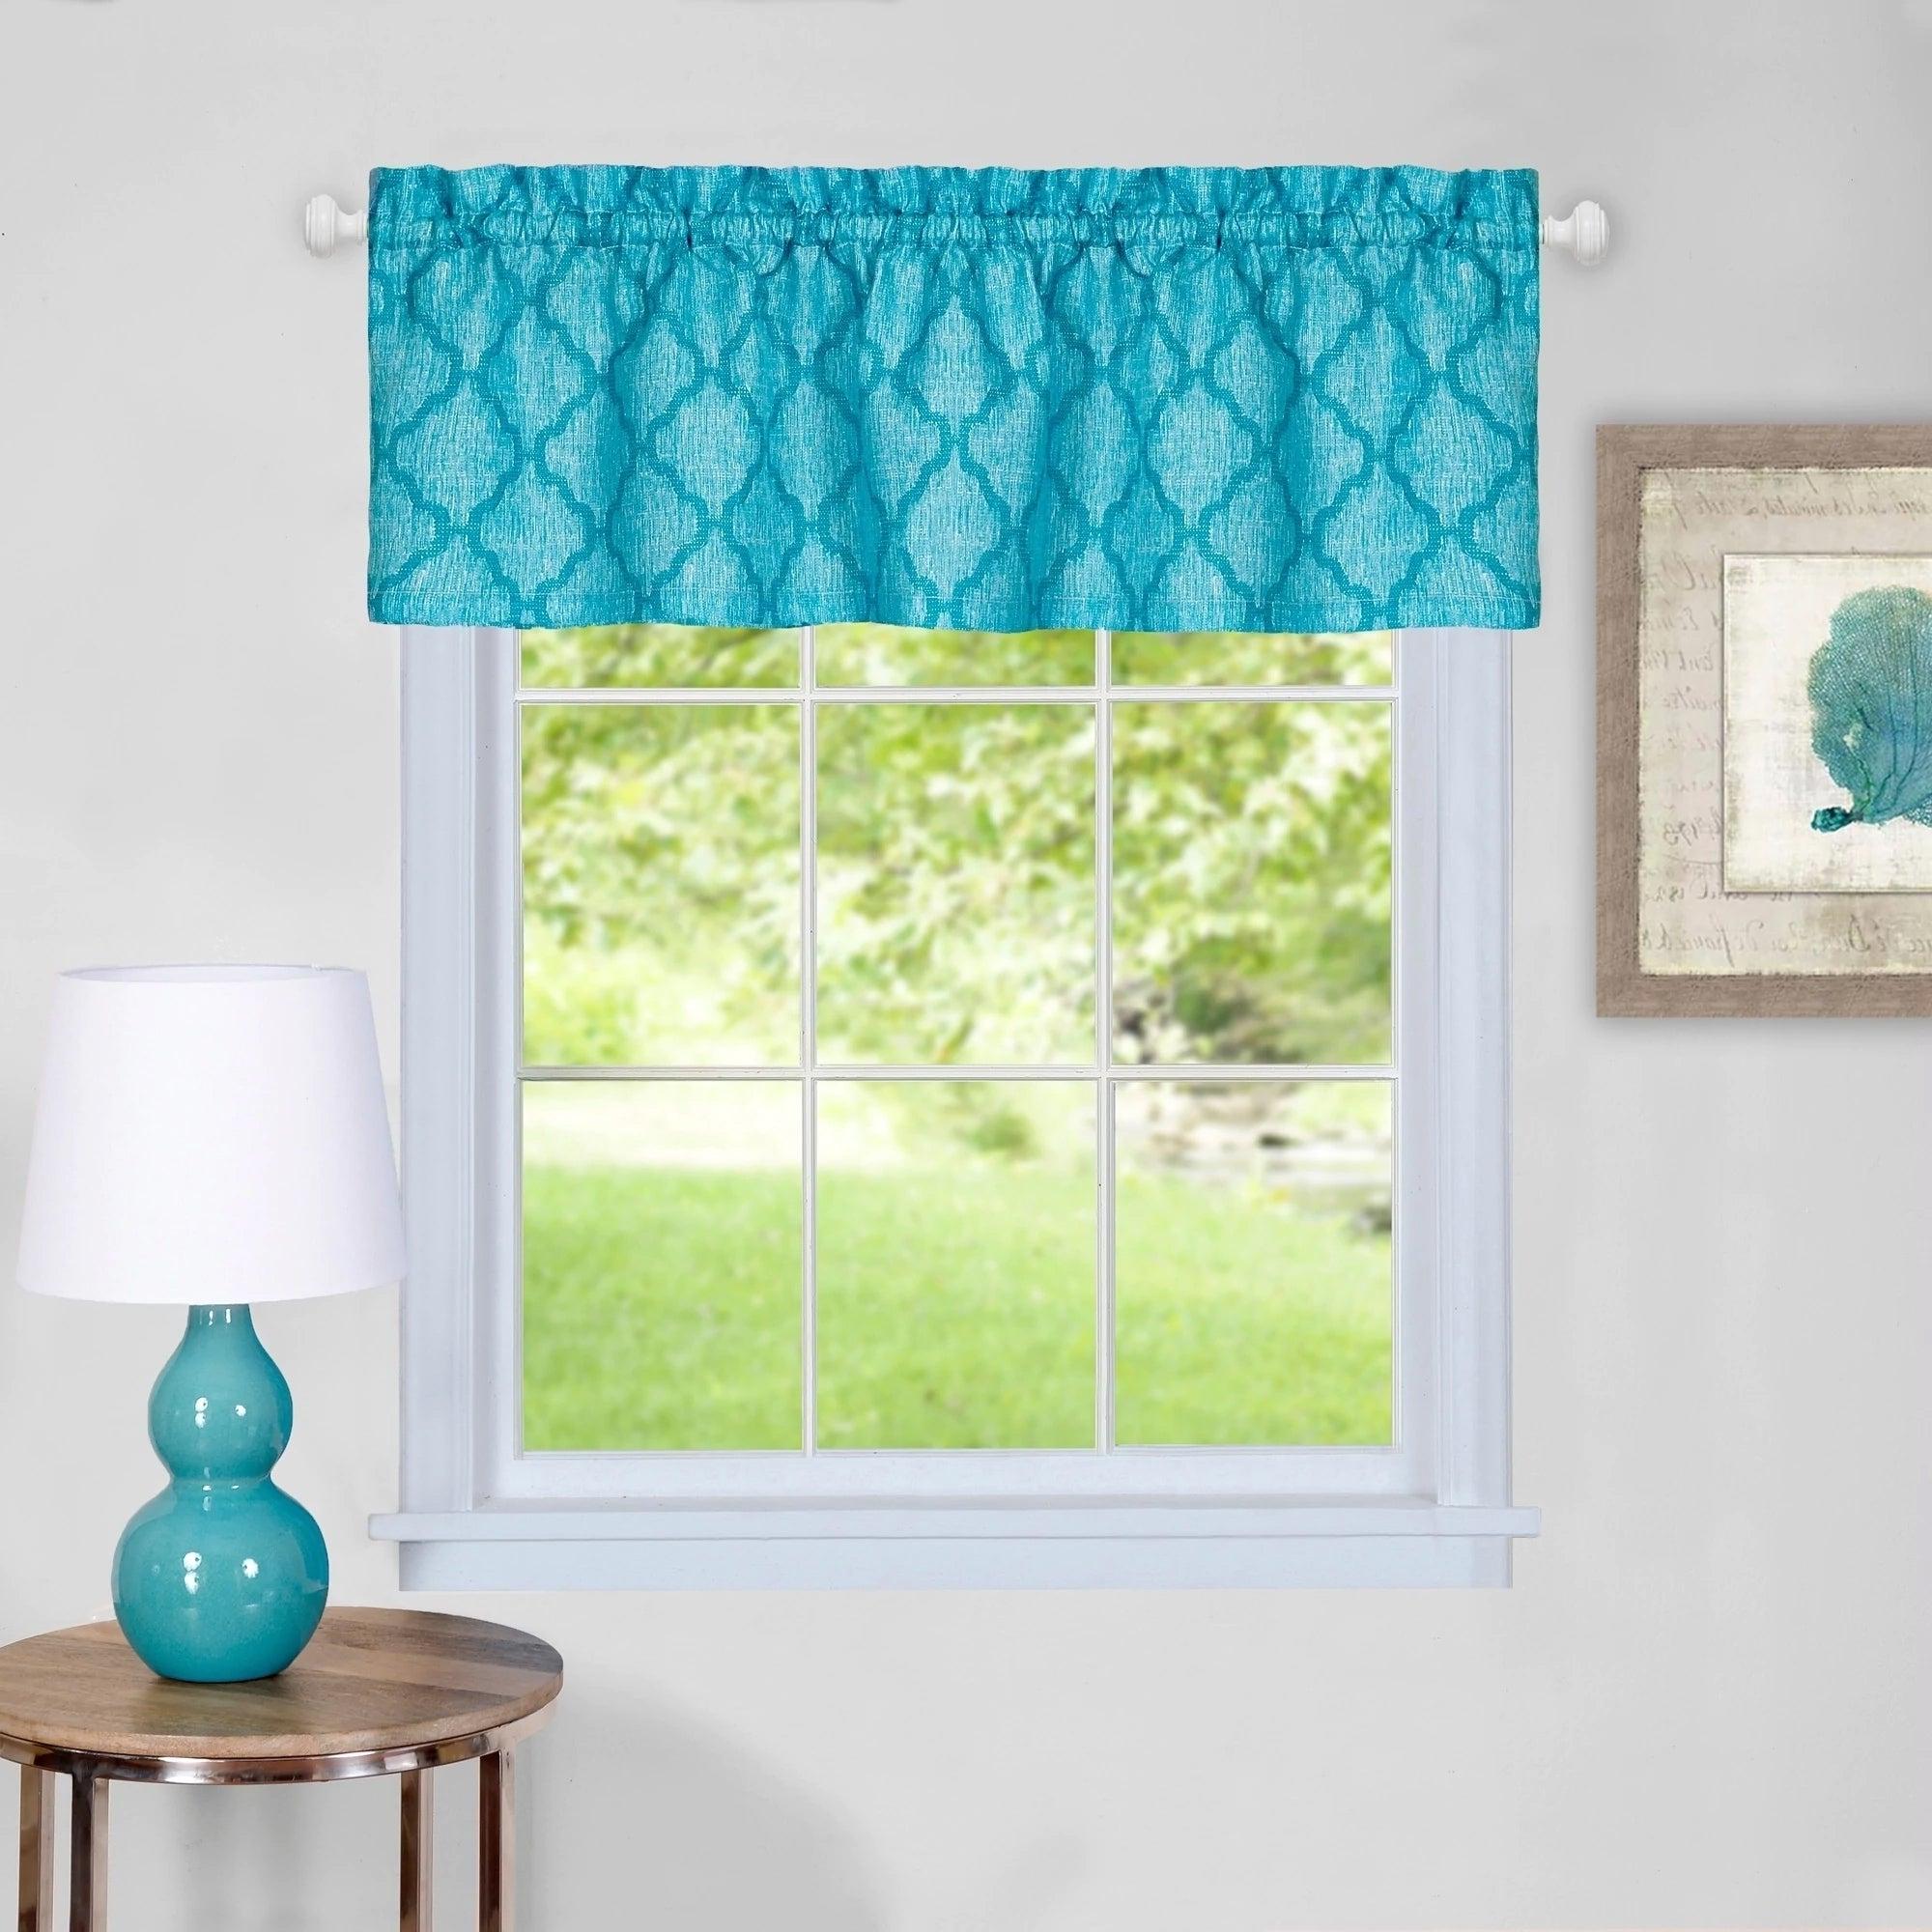 Trellis Pattern Window Valances Pertaining To Recent Trellis Pattern Window Valance (turquoise) (View 5 of 20)